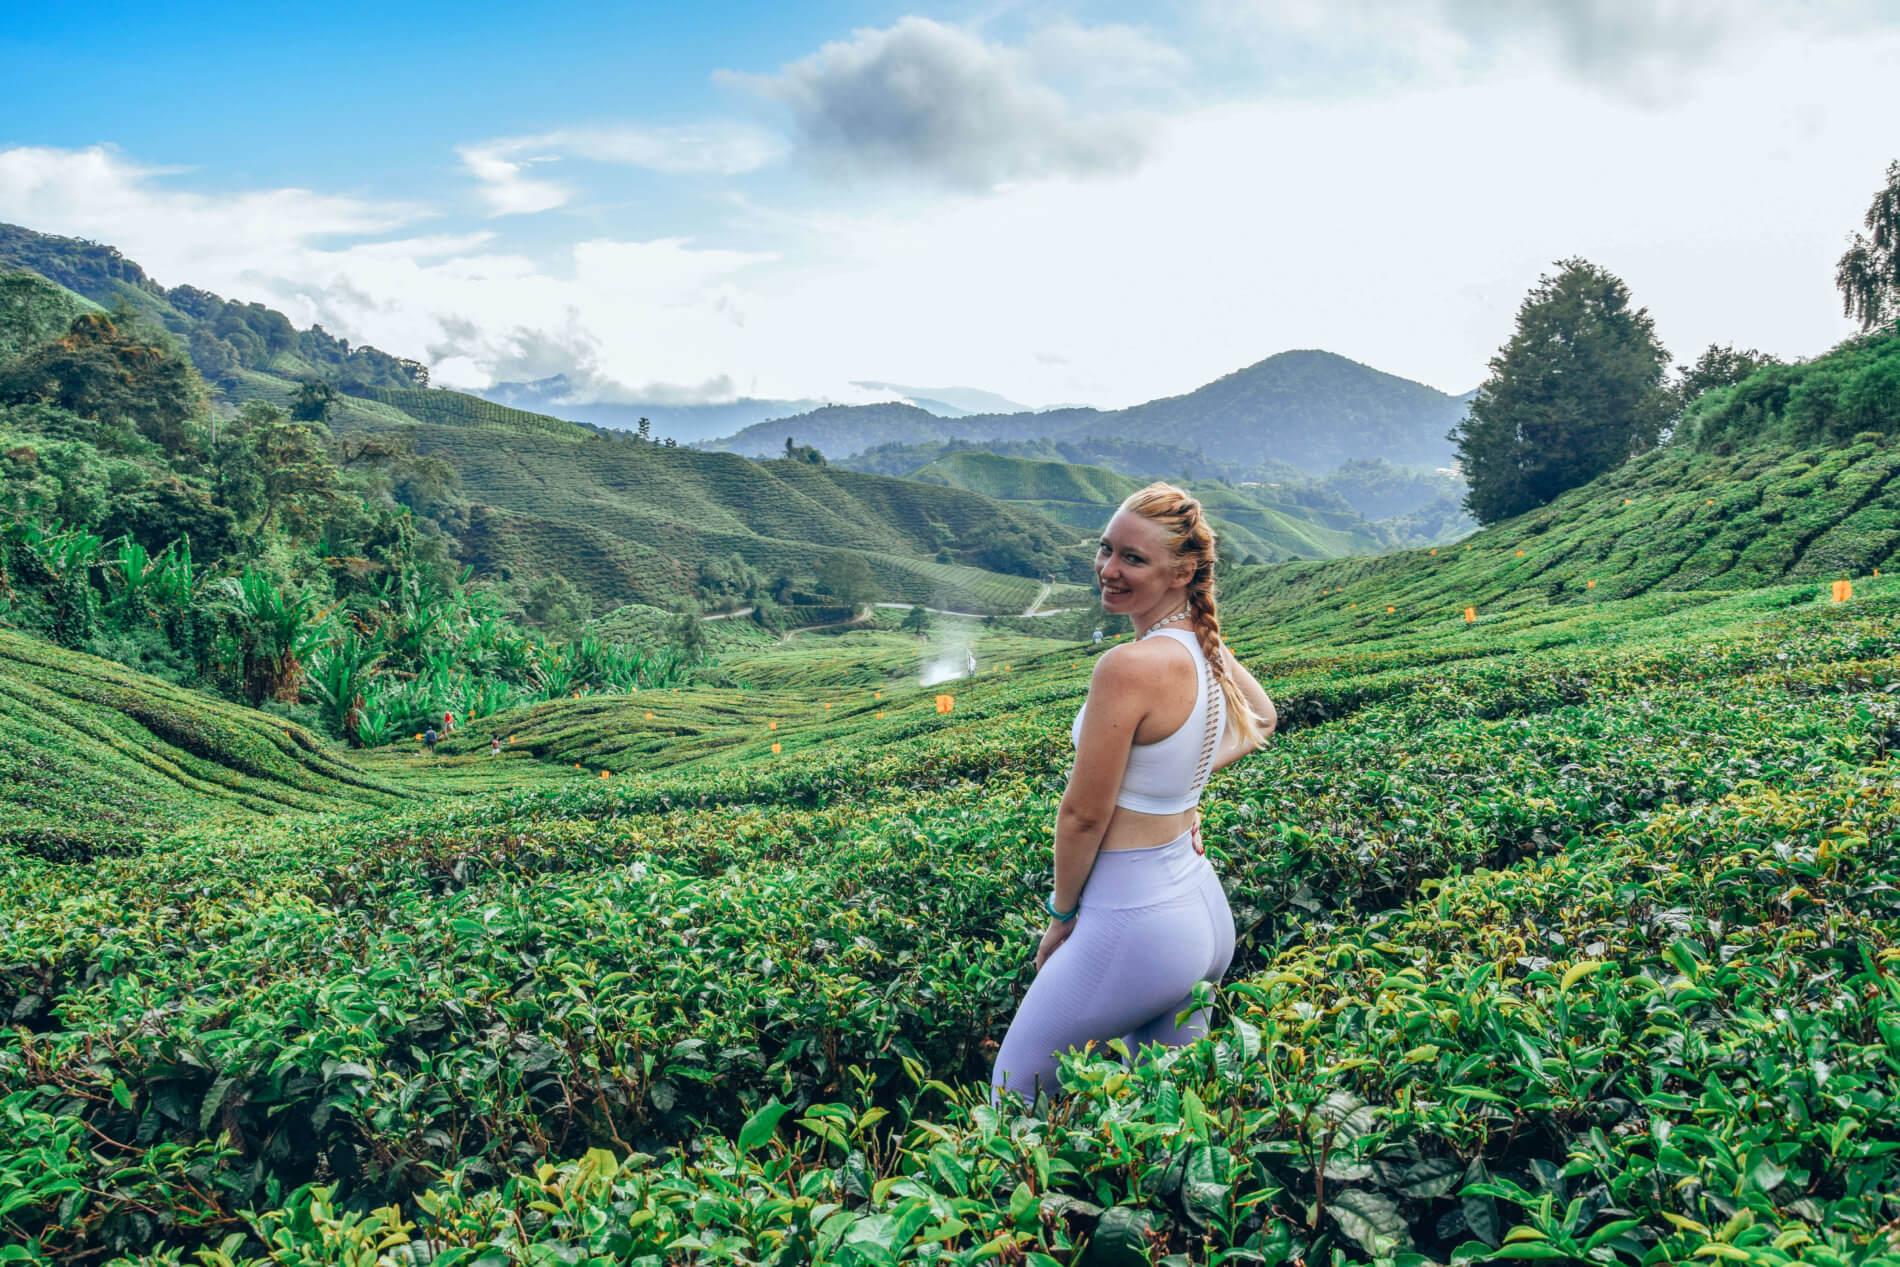 Cameron Highland-Malaisie-La revue de Kathleen-Blog-Lifestyle-voyage-Paris